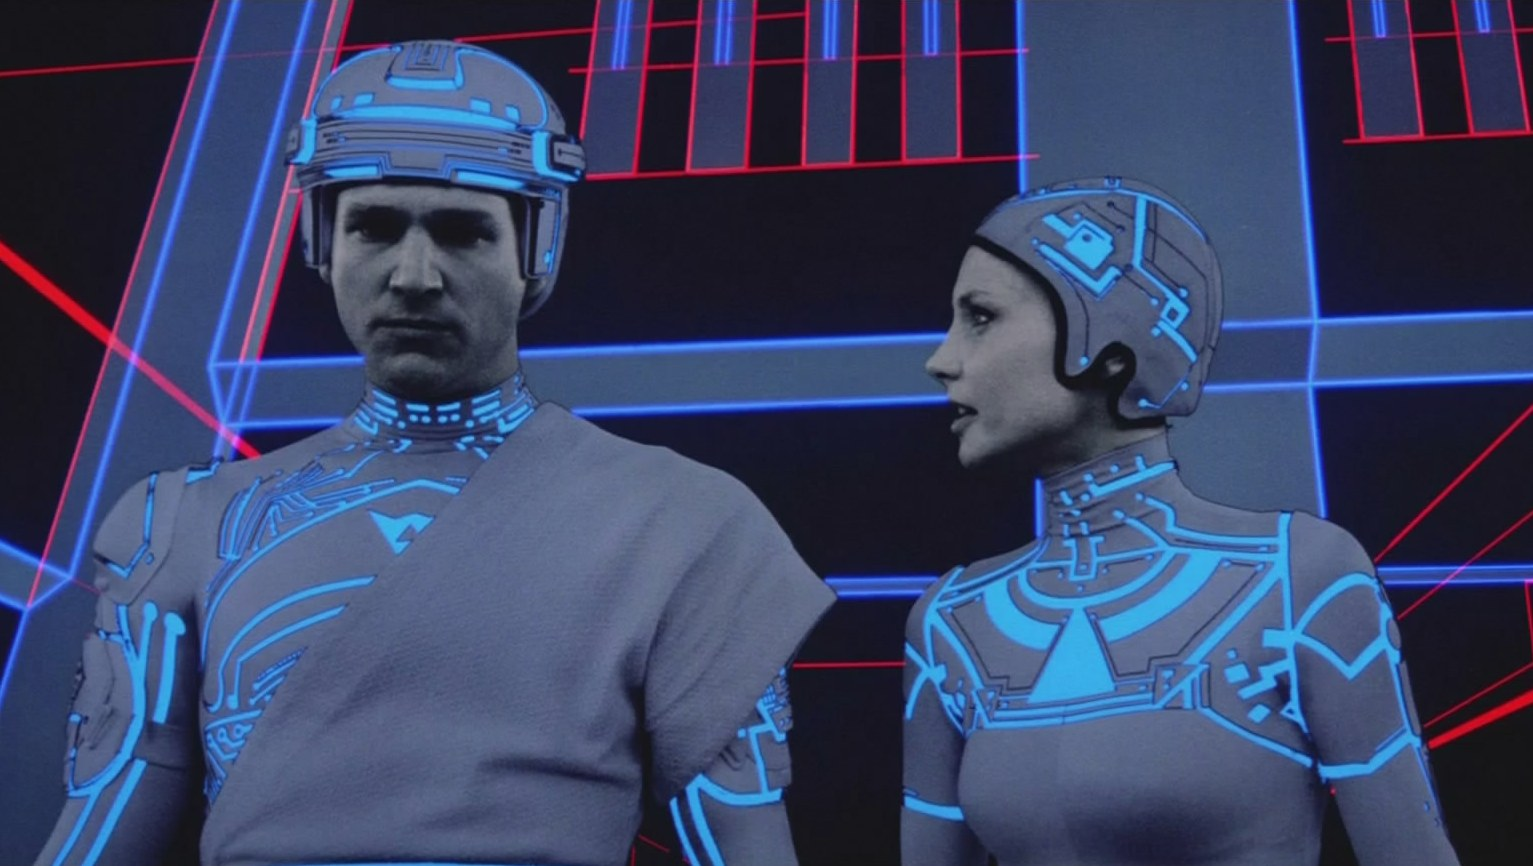 「Tron movie 1982」の画像検索結果